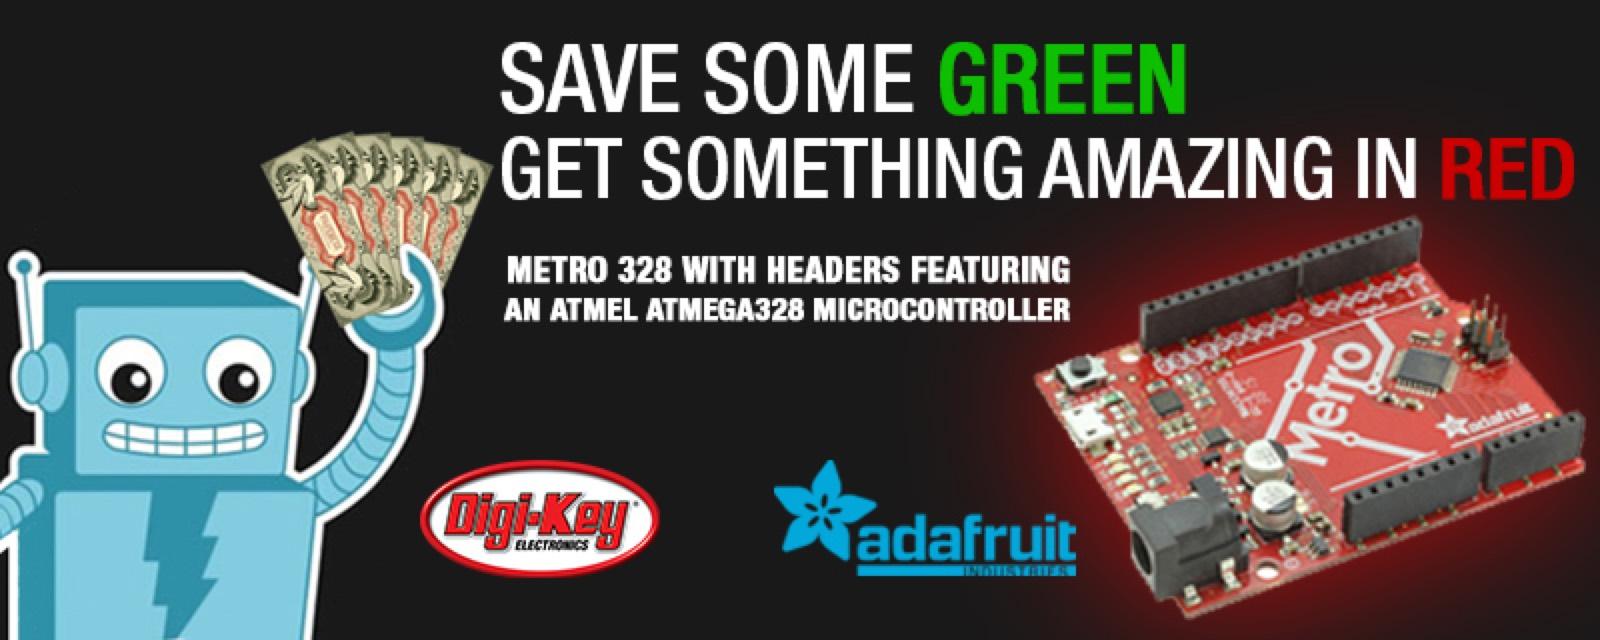 Adafruit-Metro328 Website-Card-800X320